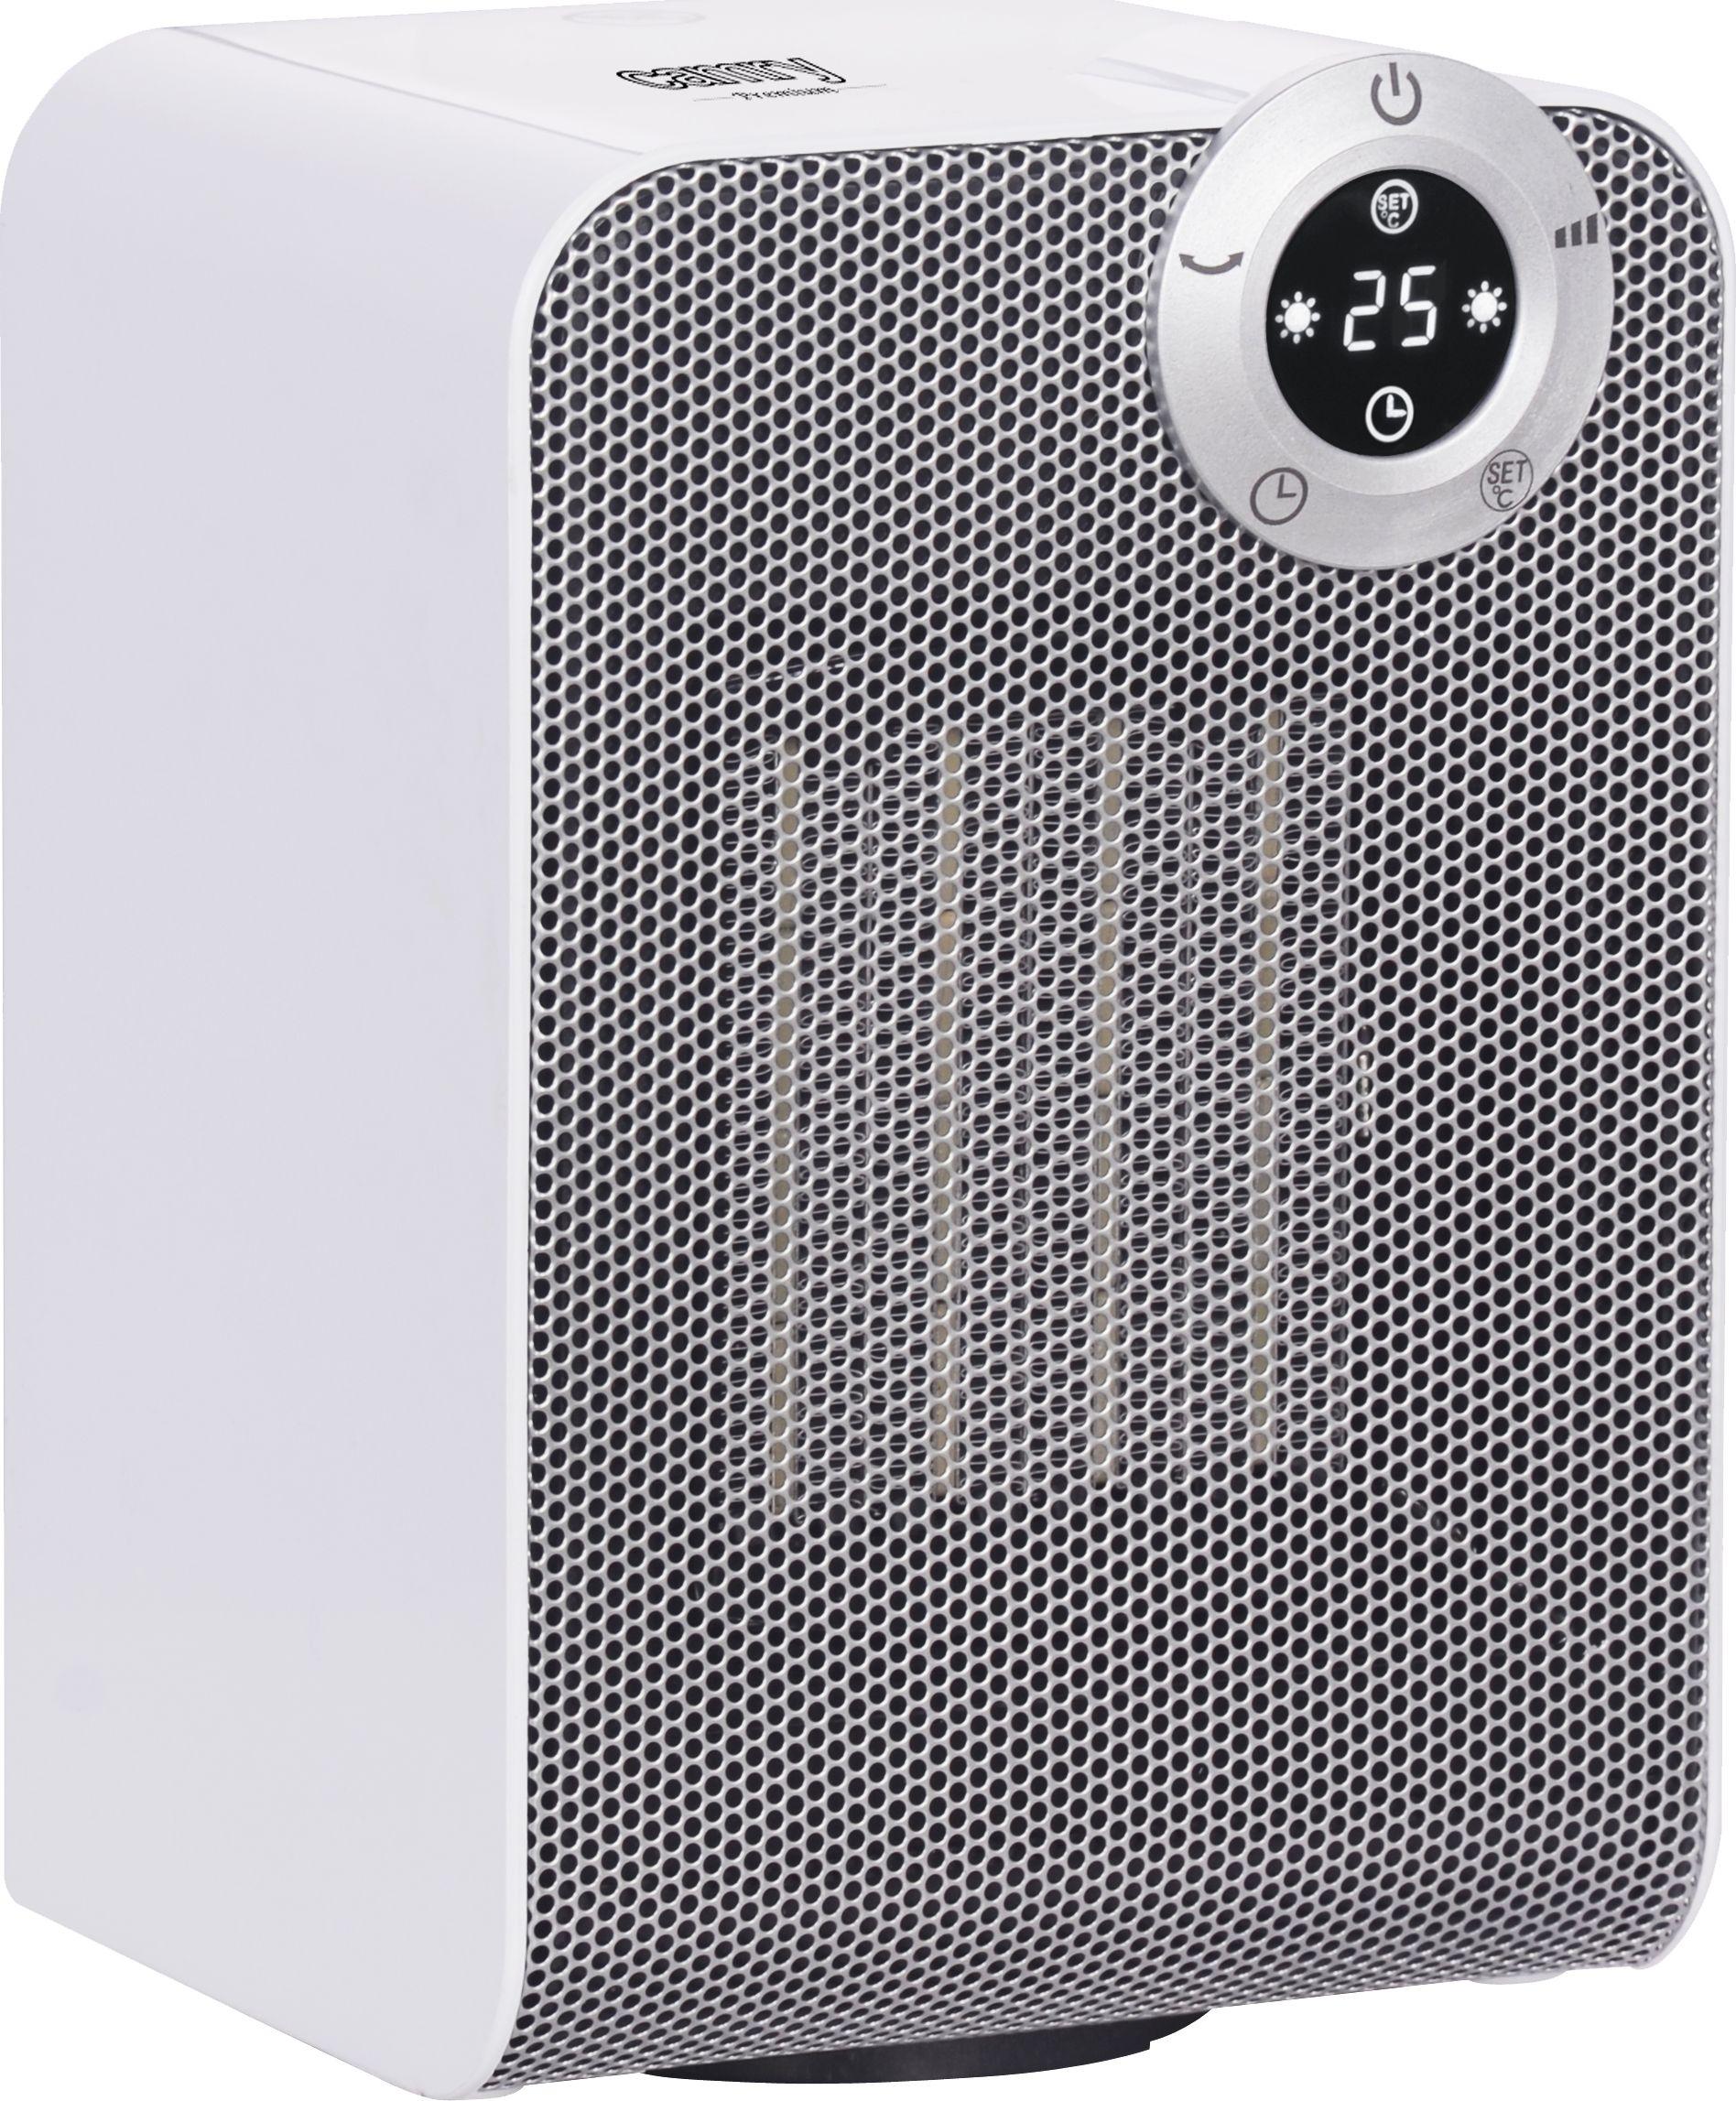 Ceramic fan heater LCD+ Timer CR 7720